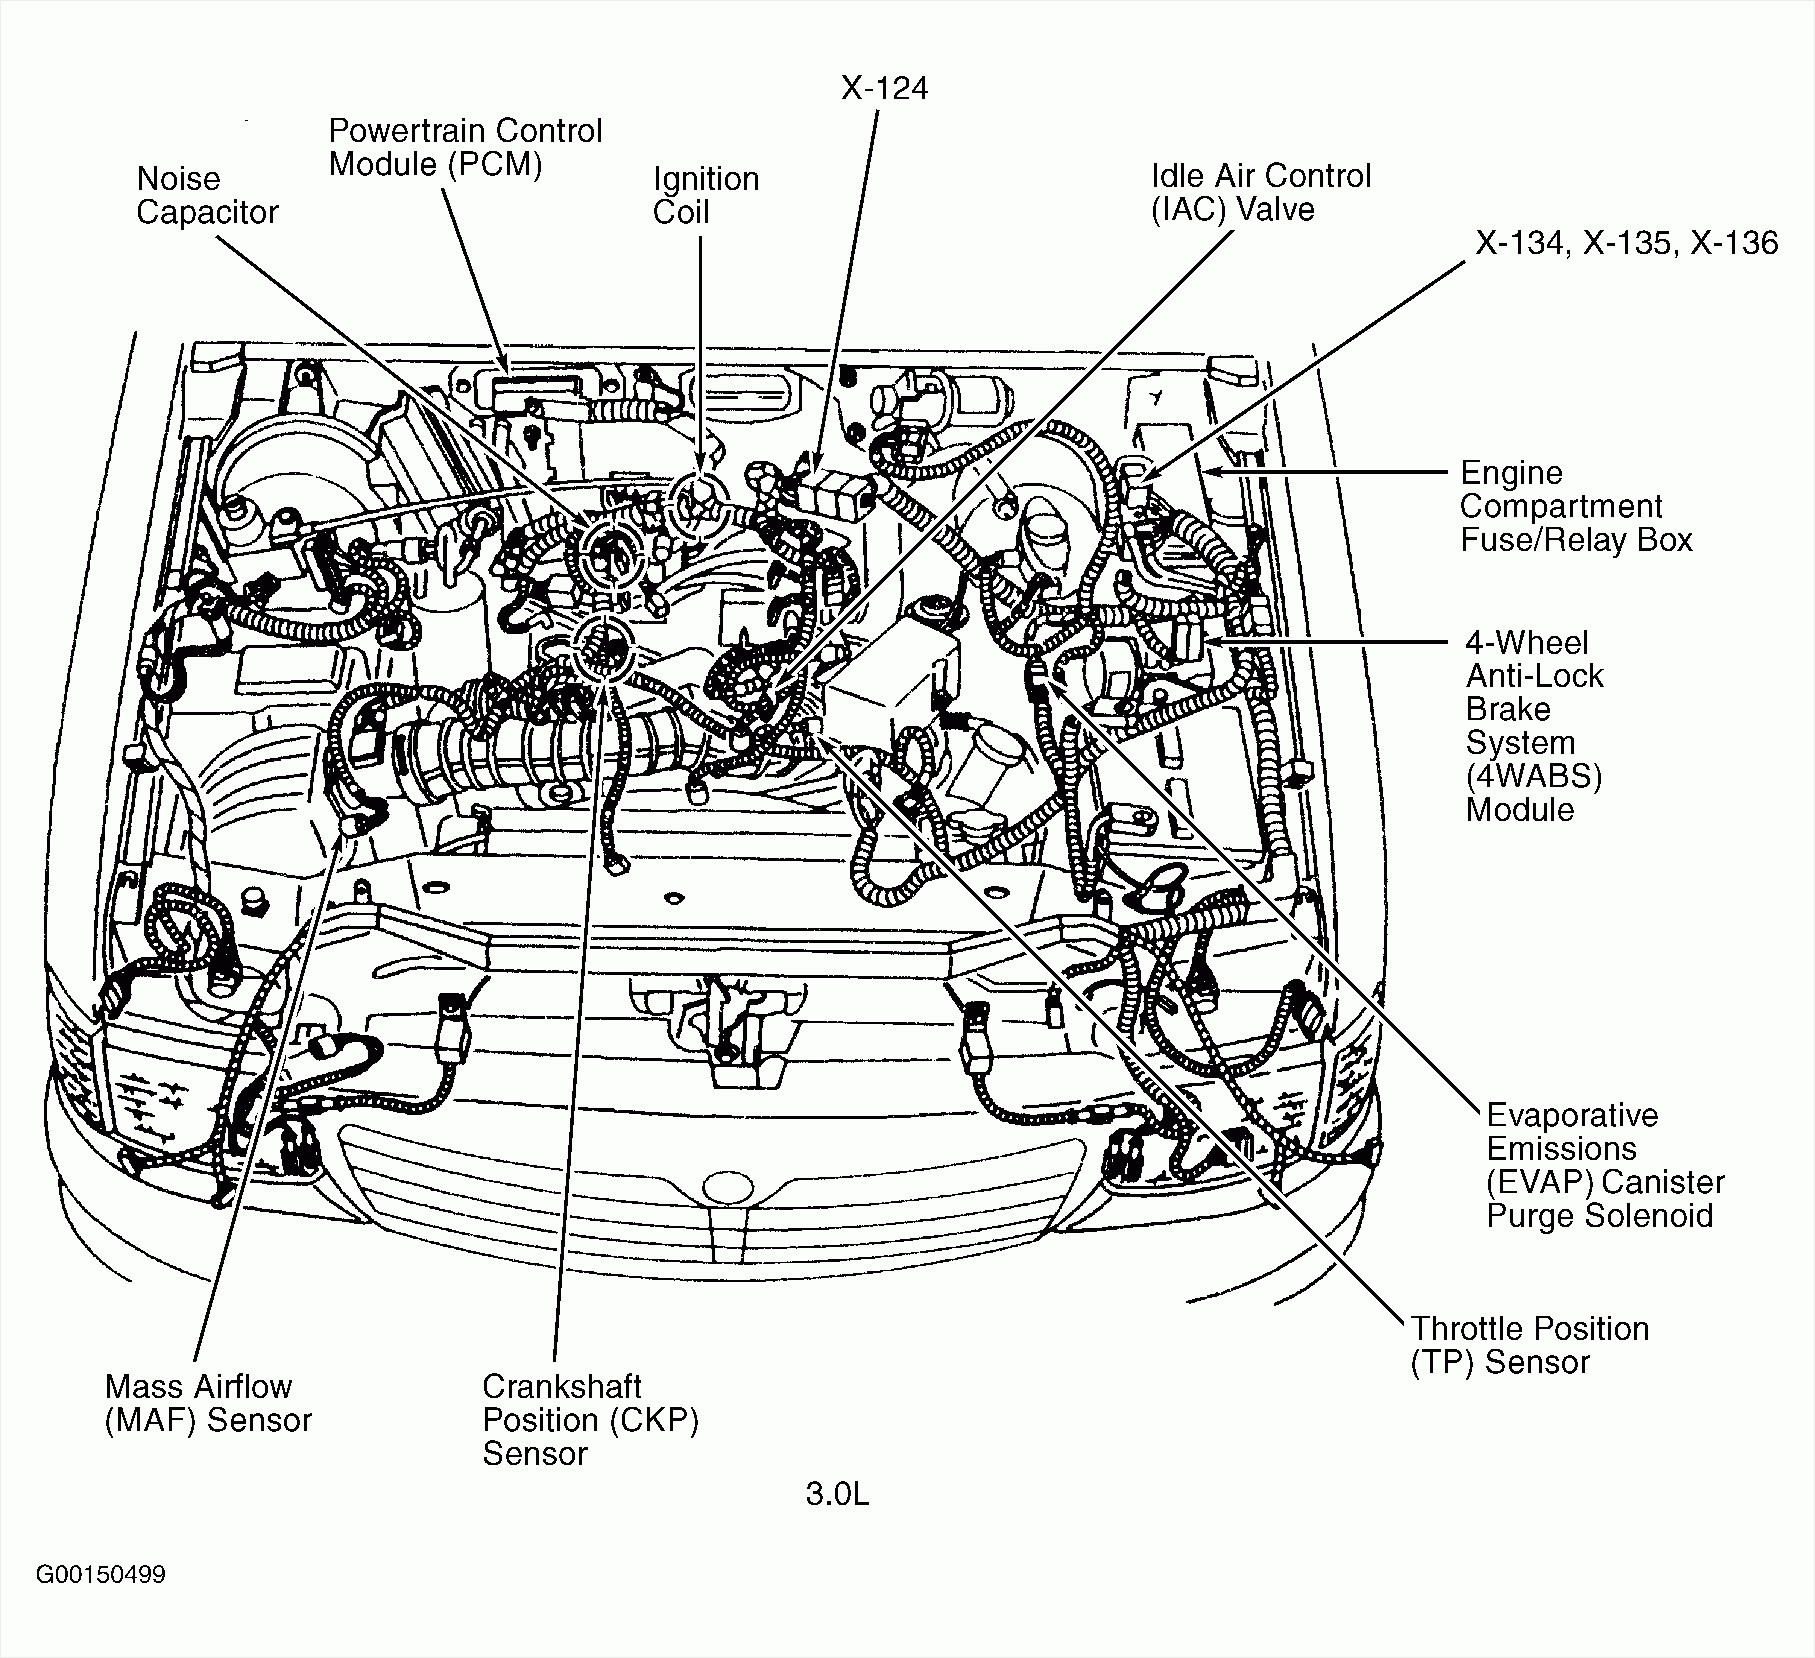 2007 Mustang V6 Engine Diagram Books Of Wiring Corvette Diagrams 1998 Ford To Rh Detoxicrecenze Com